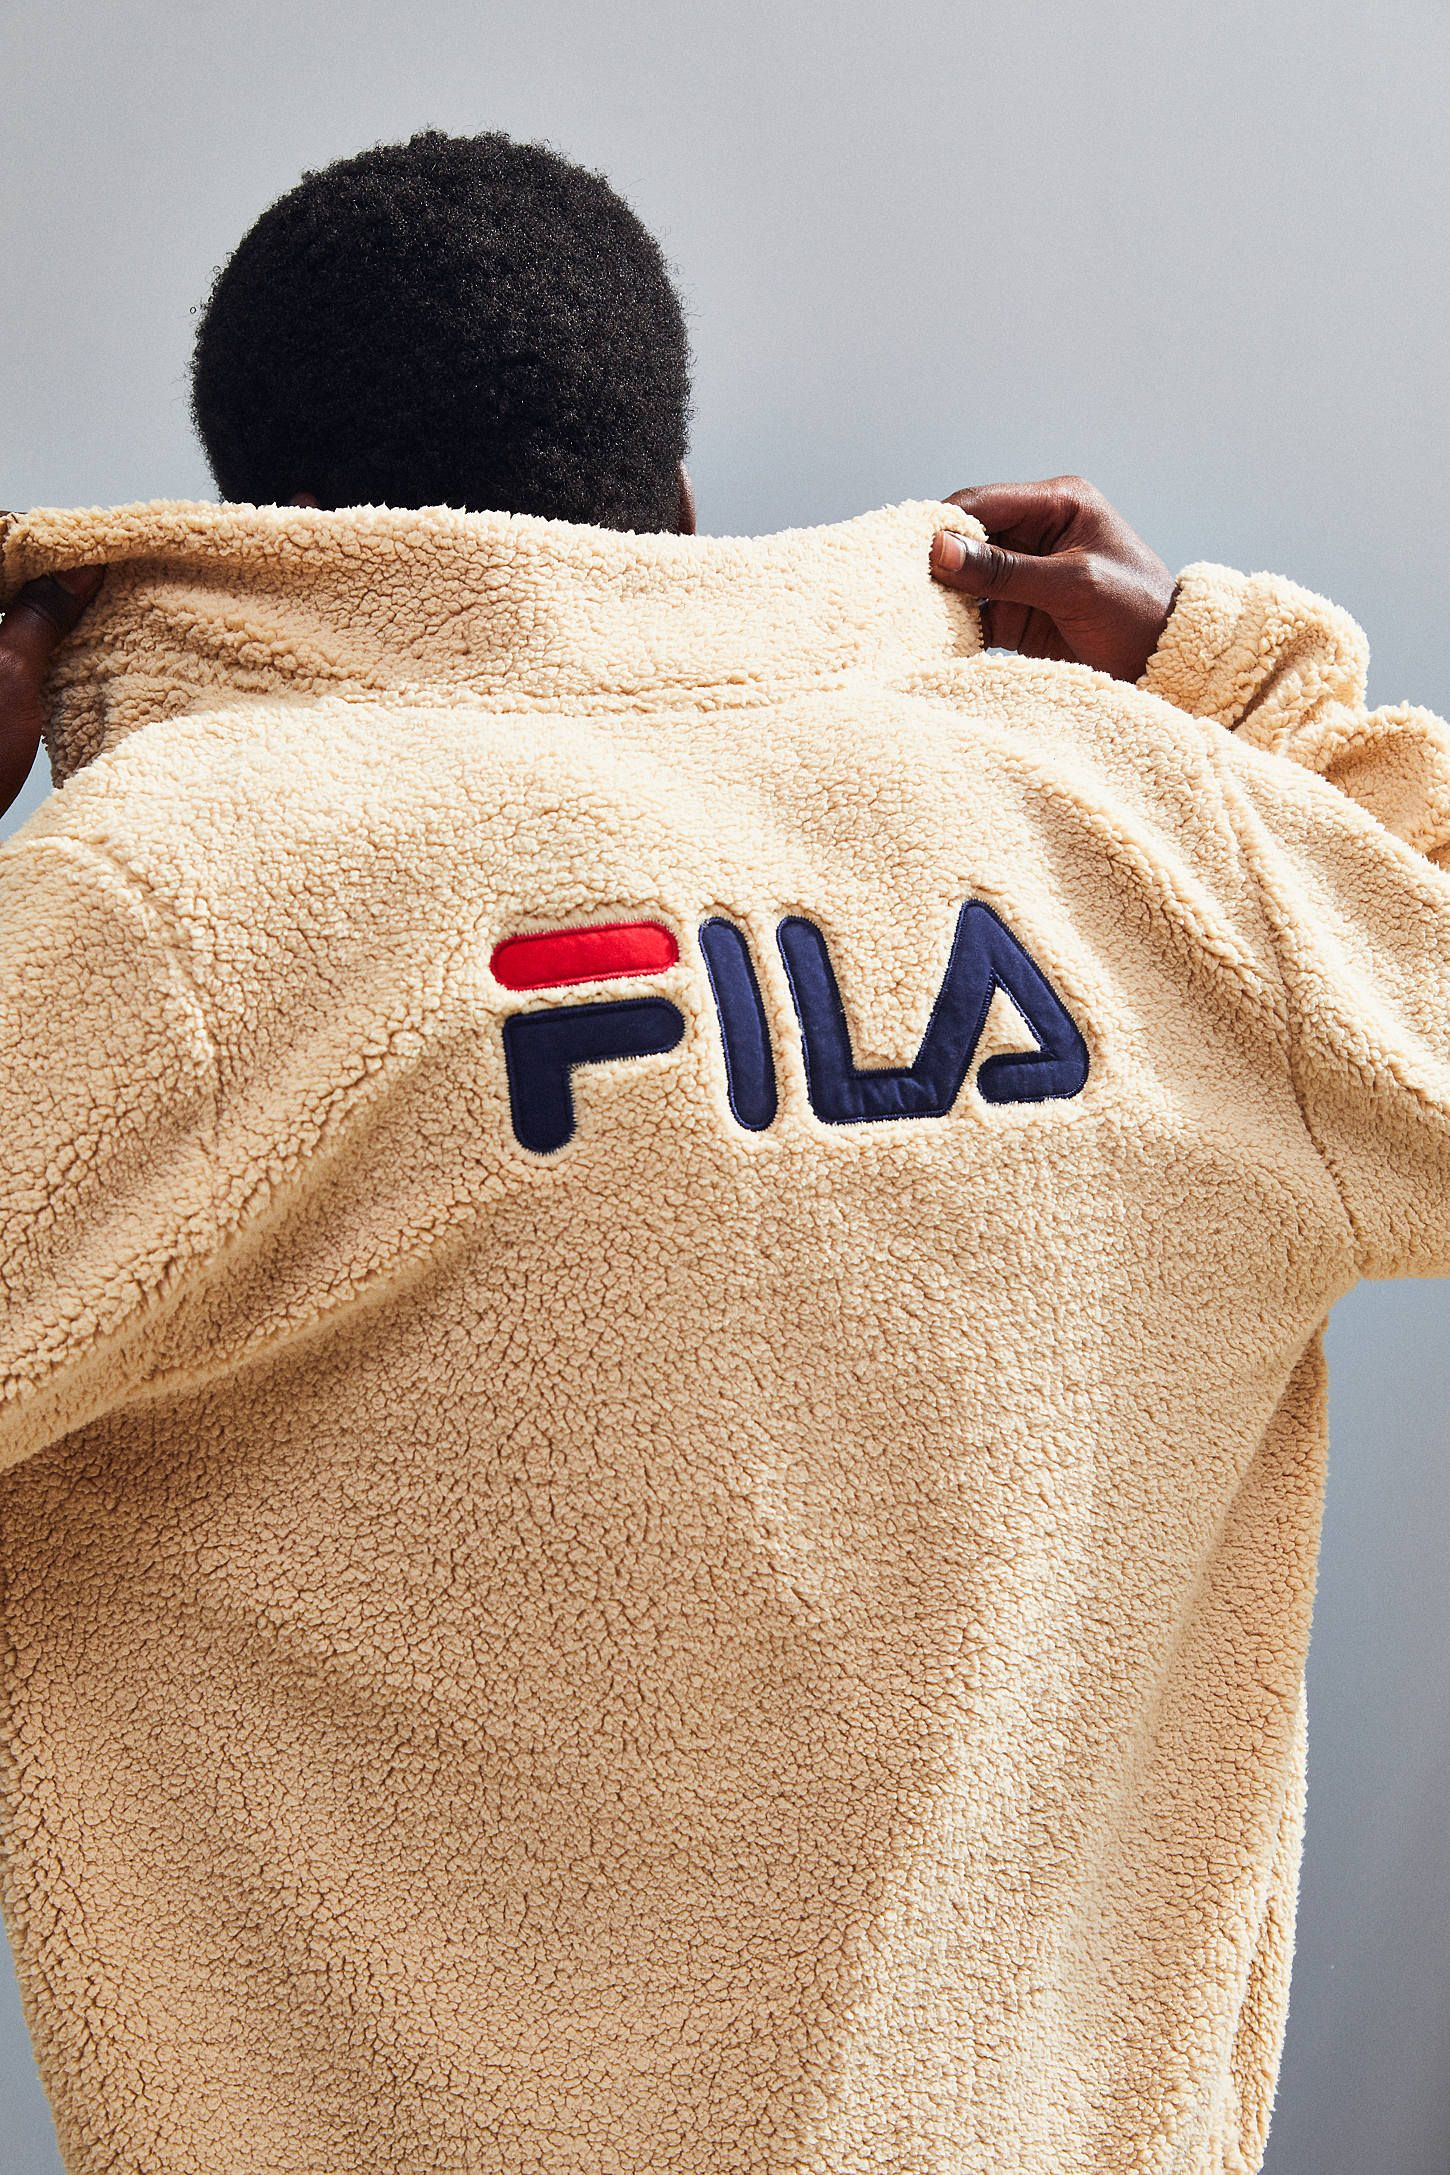 afdd7e8bf0a3 FILA UO Exclusive McMillan Zip-Up Sherpa Sweatshirt Jacket in 2019 ...